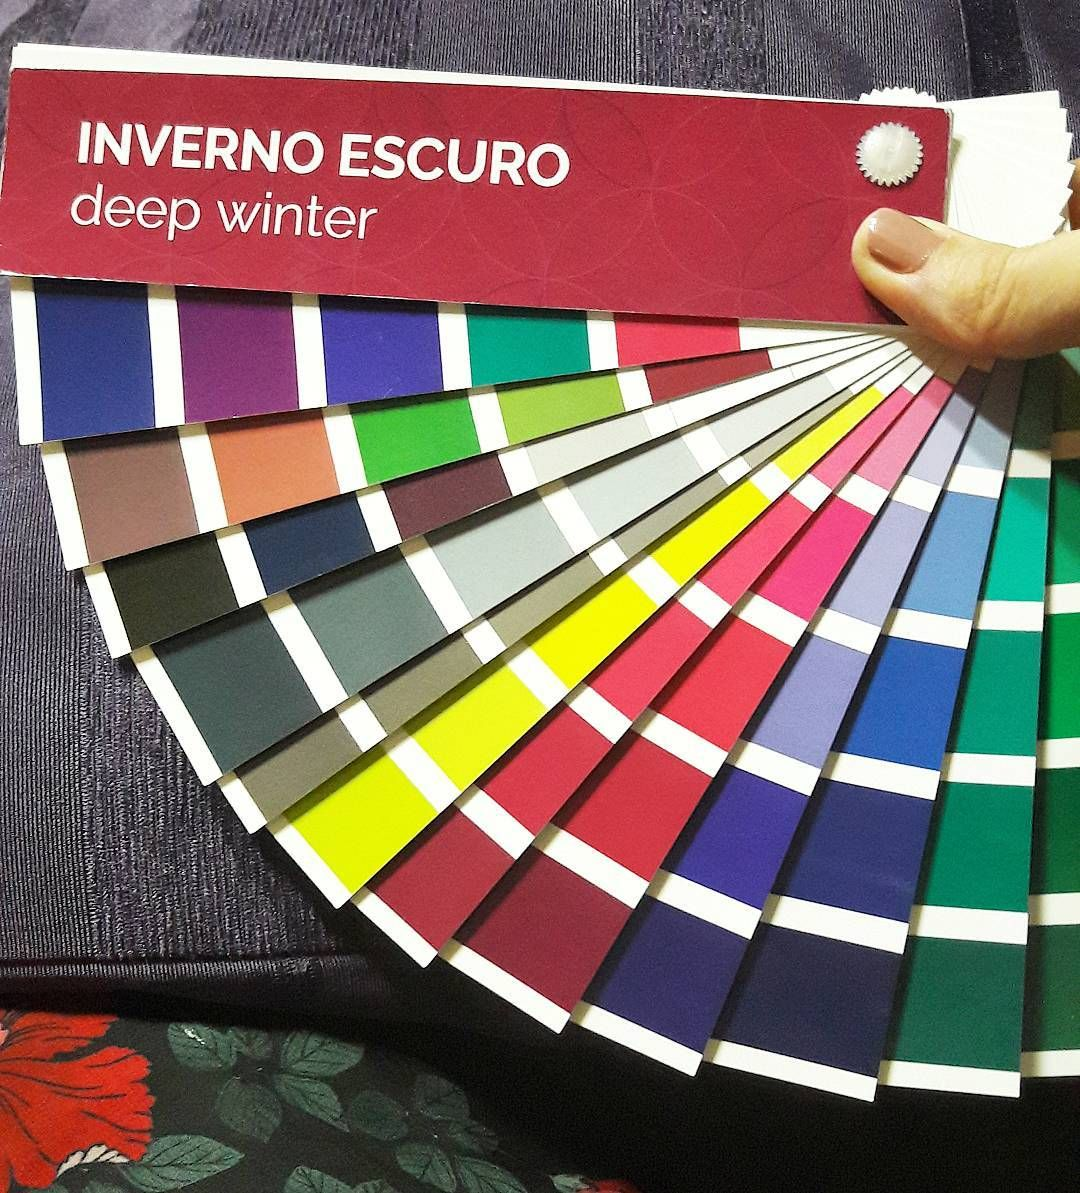 Aprenda como combinar cores no seus looks